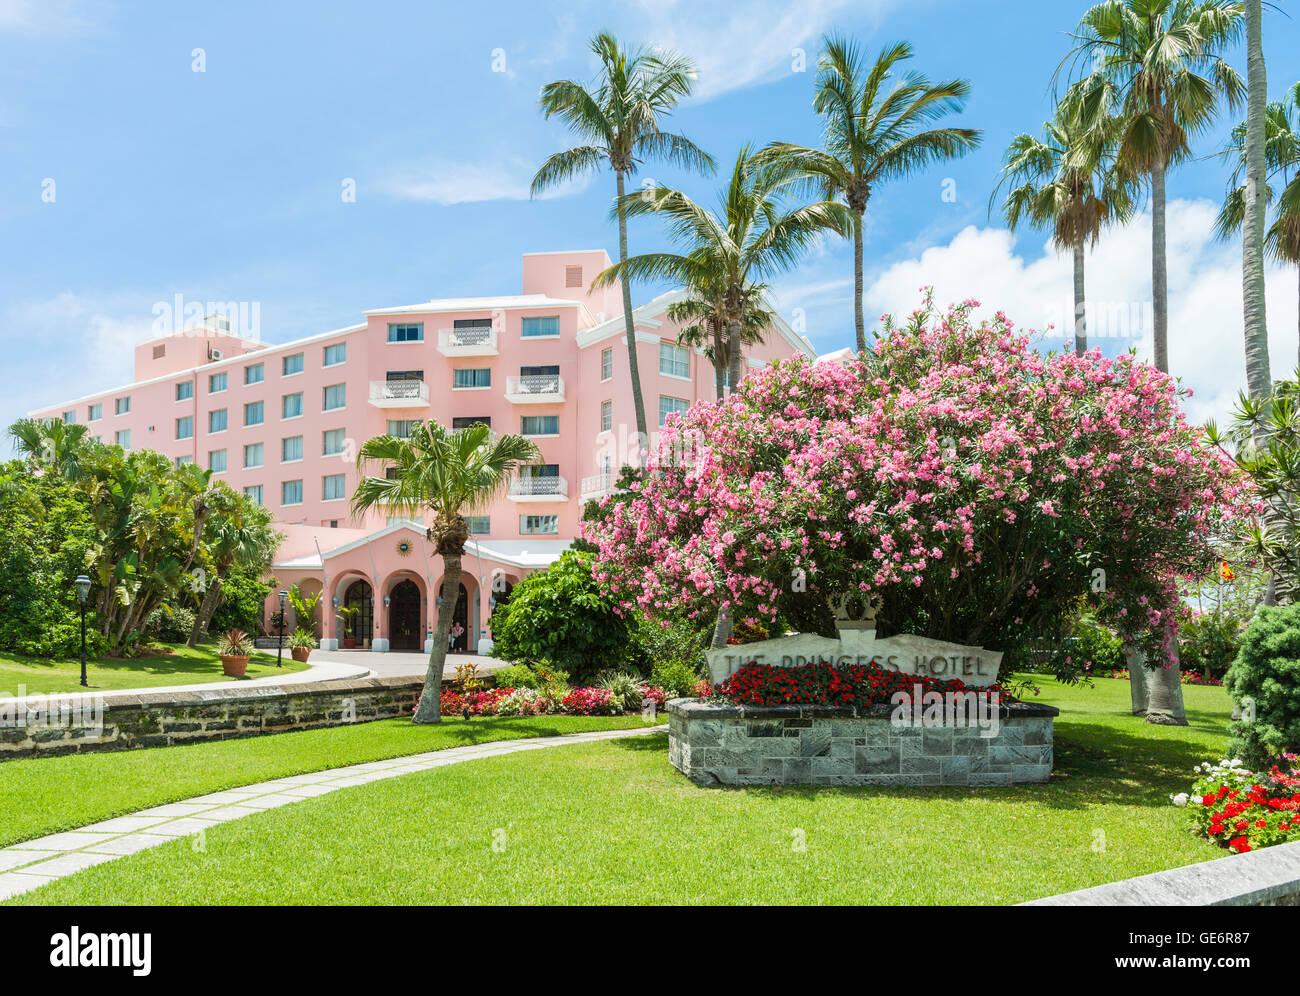 The Hamilton Princess Hotel and Beach Club, a Fairmont luxury resort hotel in Hamilton, Bermuda - Stock Image